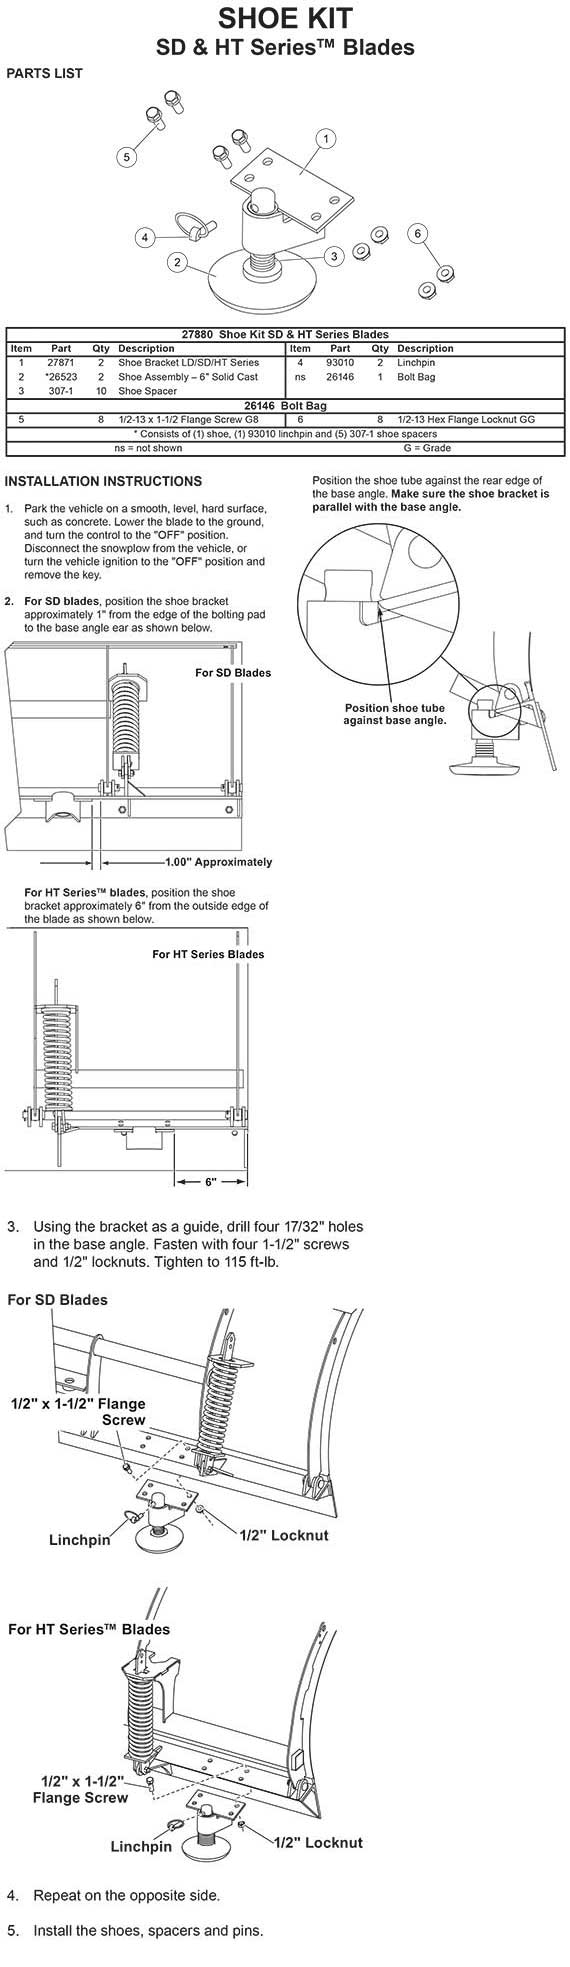 27880 Shoe Kit Sd Series W 26 High Blade Ht Fisher Xls Plow Wiring Diagram